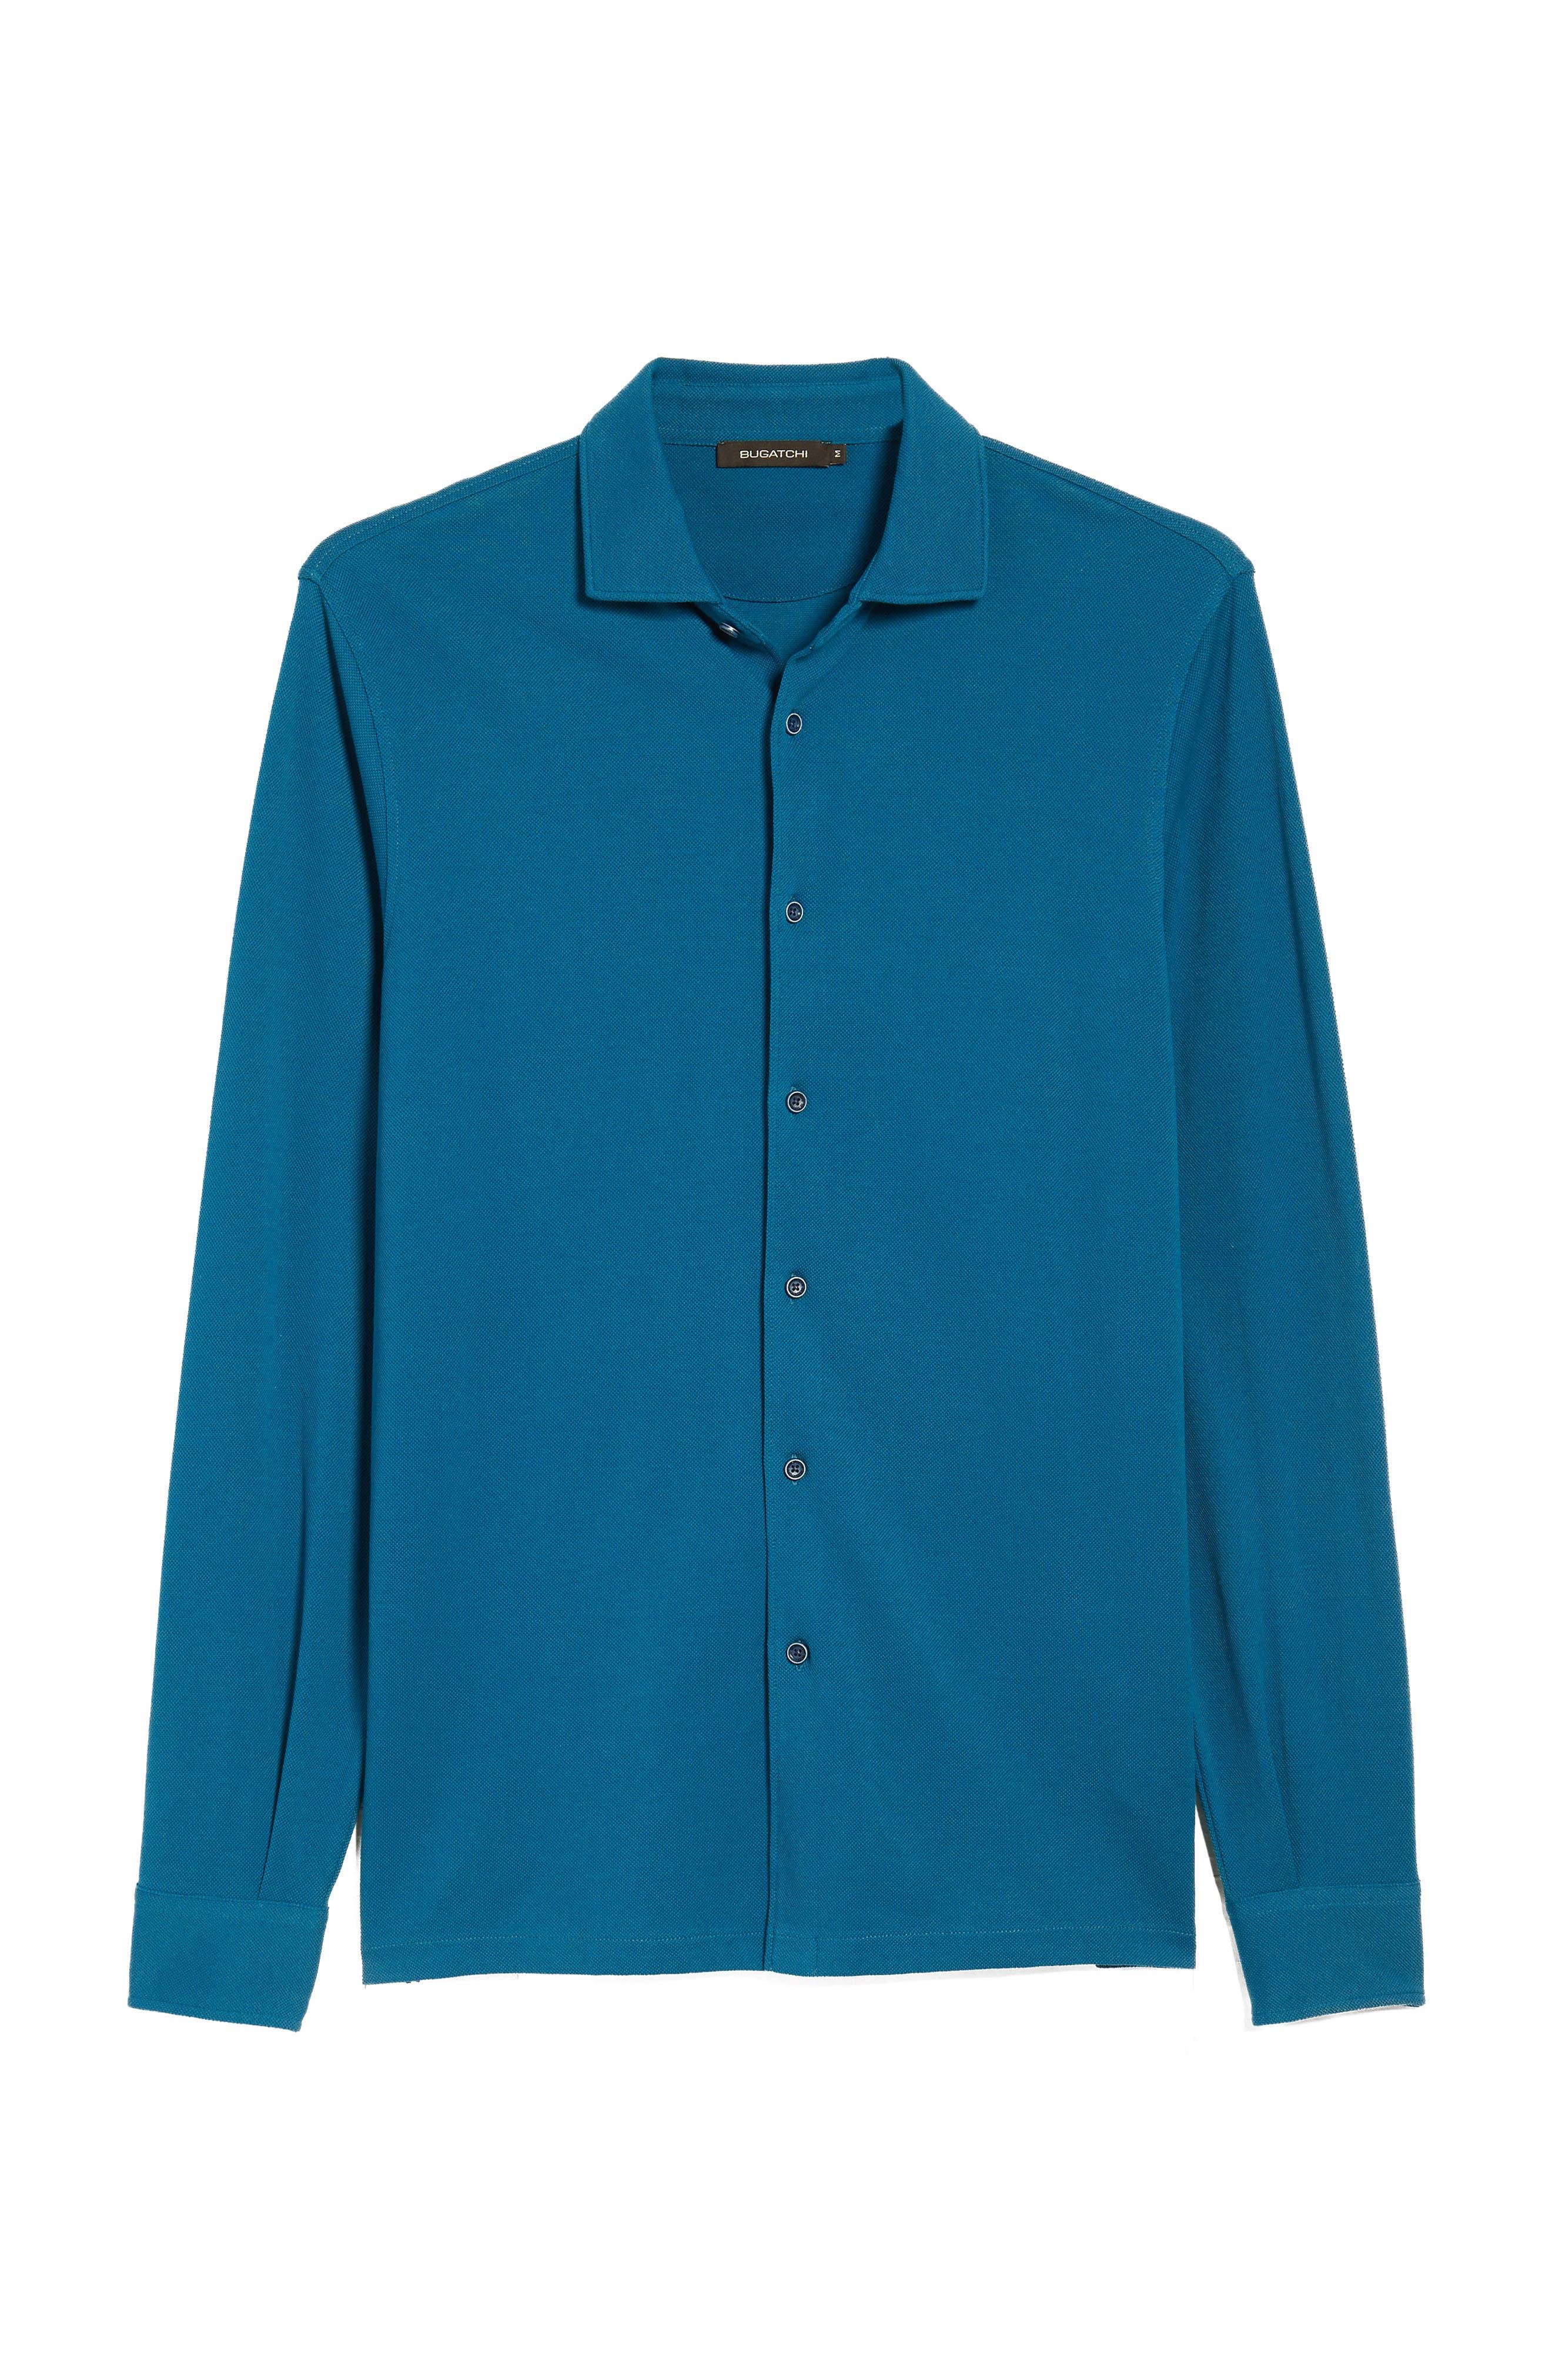 Regular Fit Knit Sport Shirt,                             Alternate thumbnail 6, color,                             445